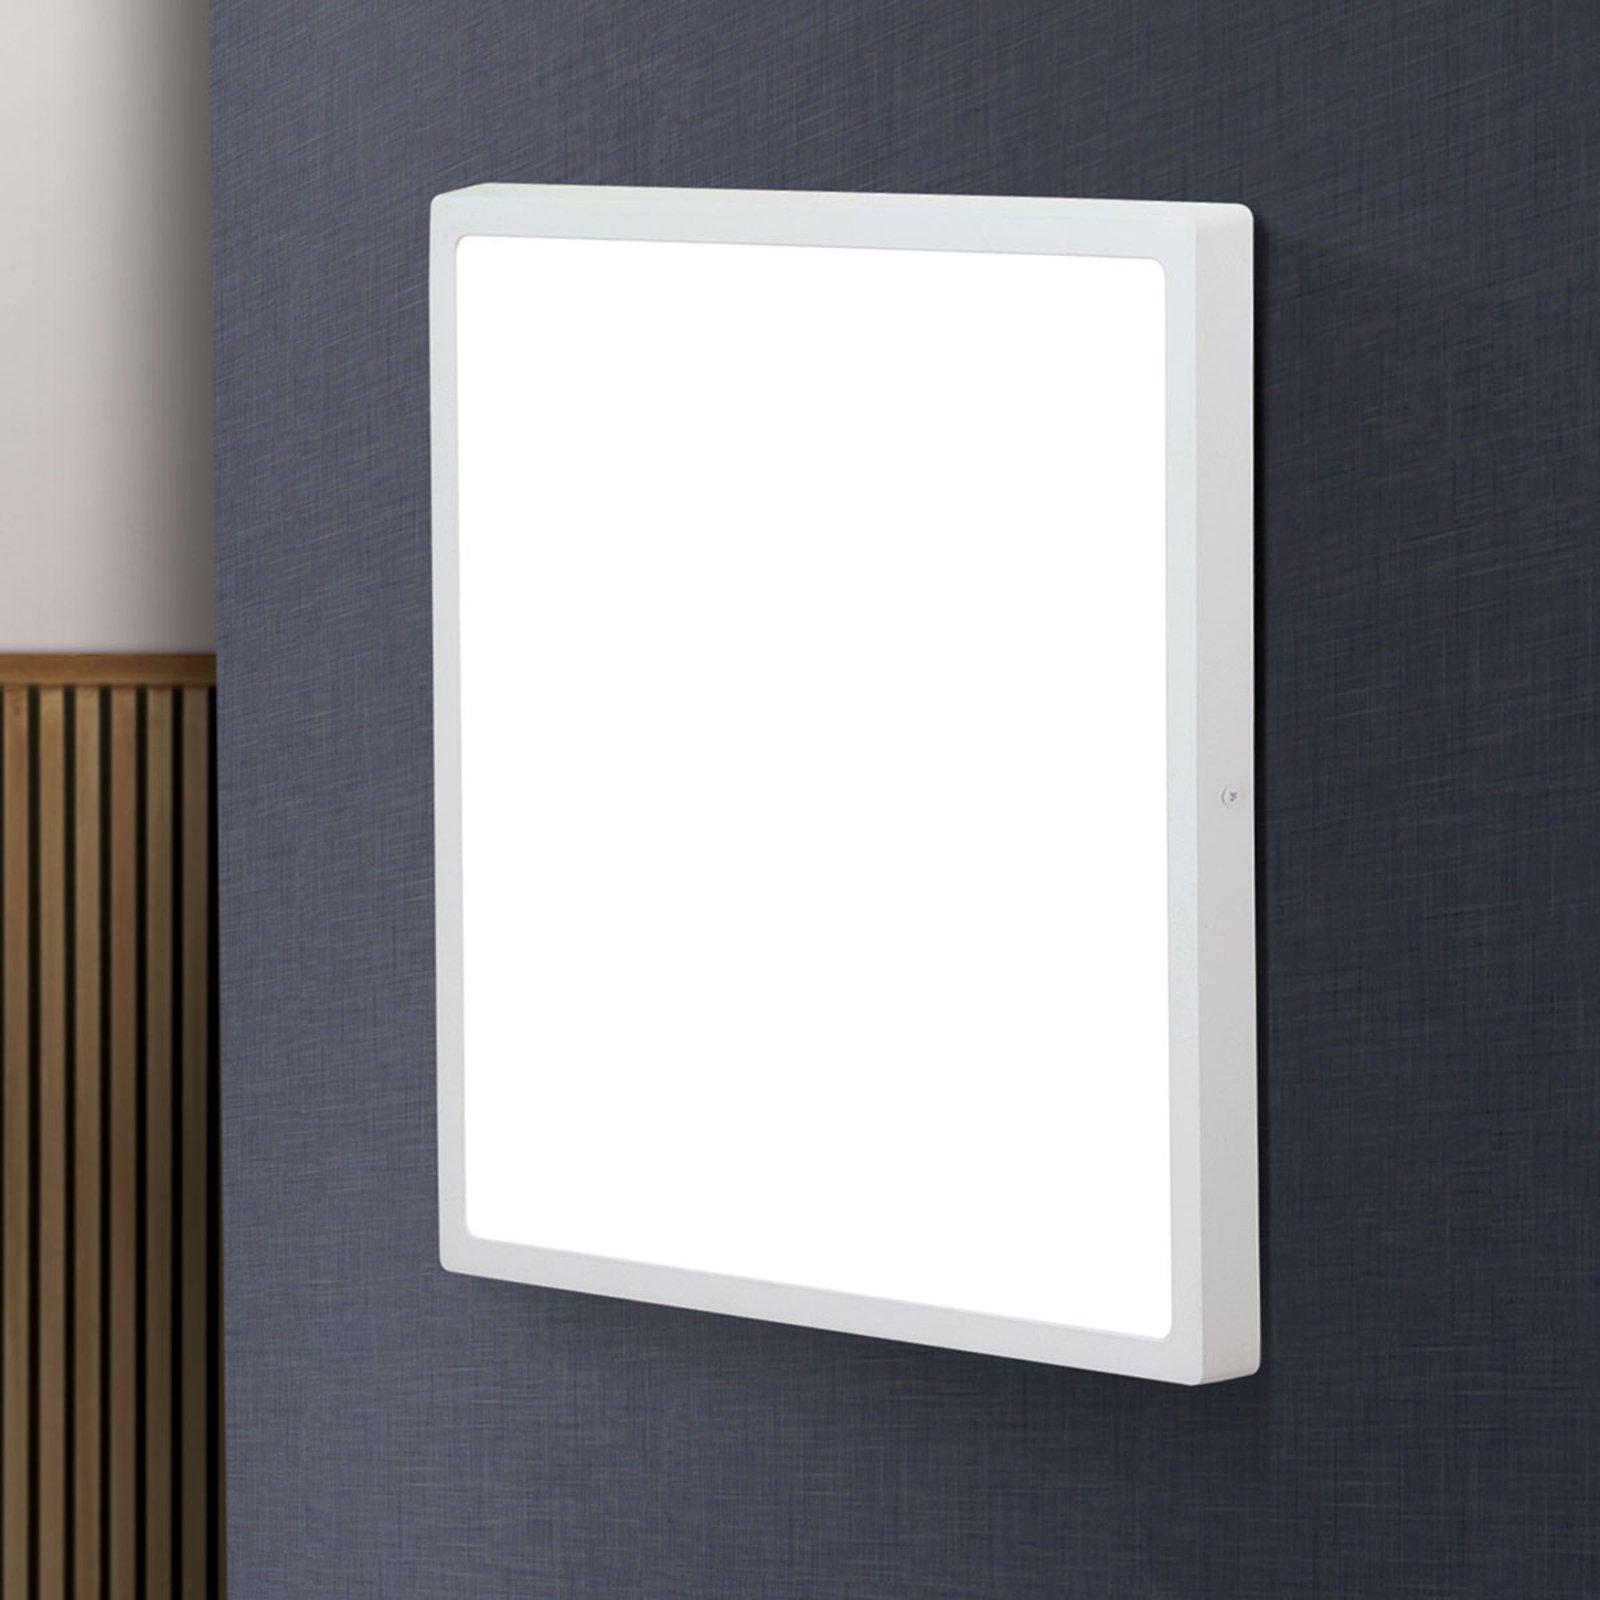 Kantet LED-taklampe Lero - 40 x 40 cm